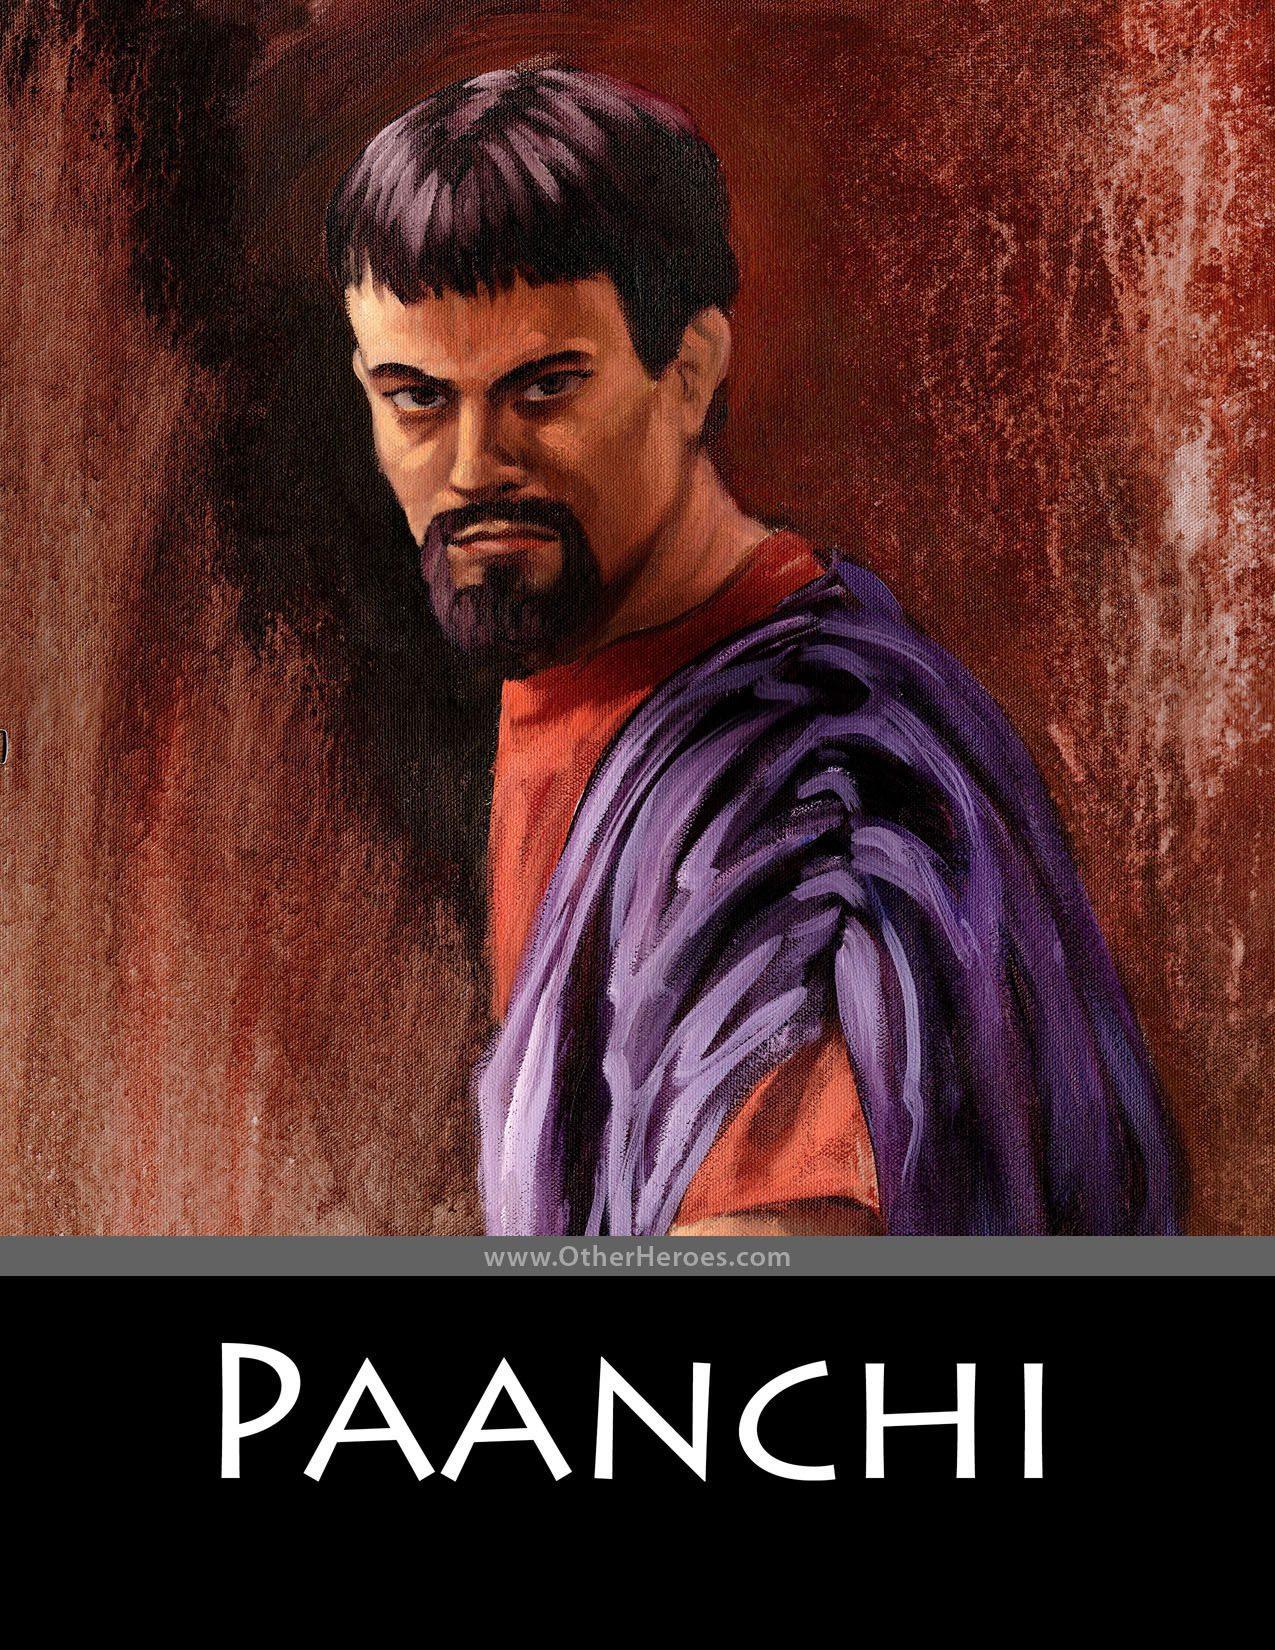 paanchi